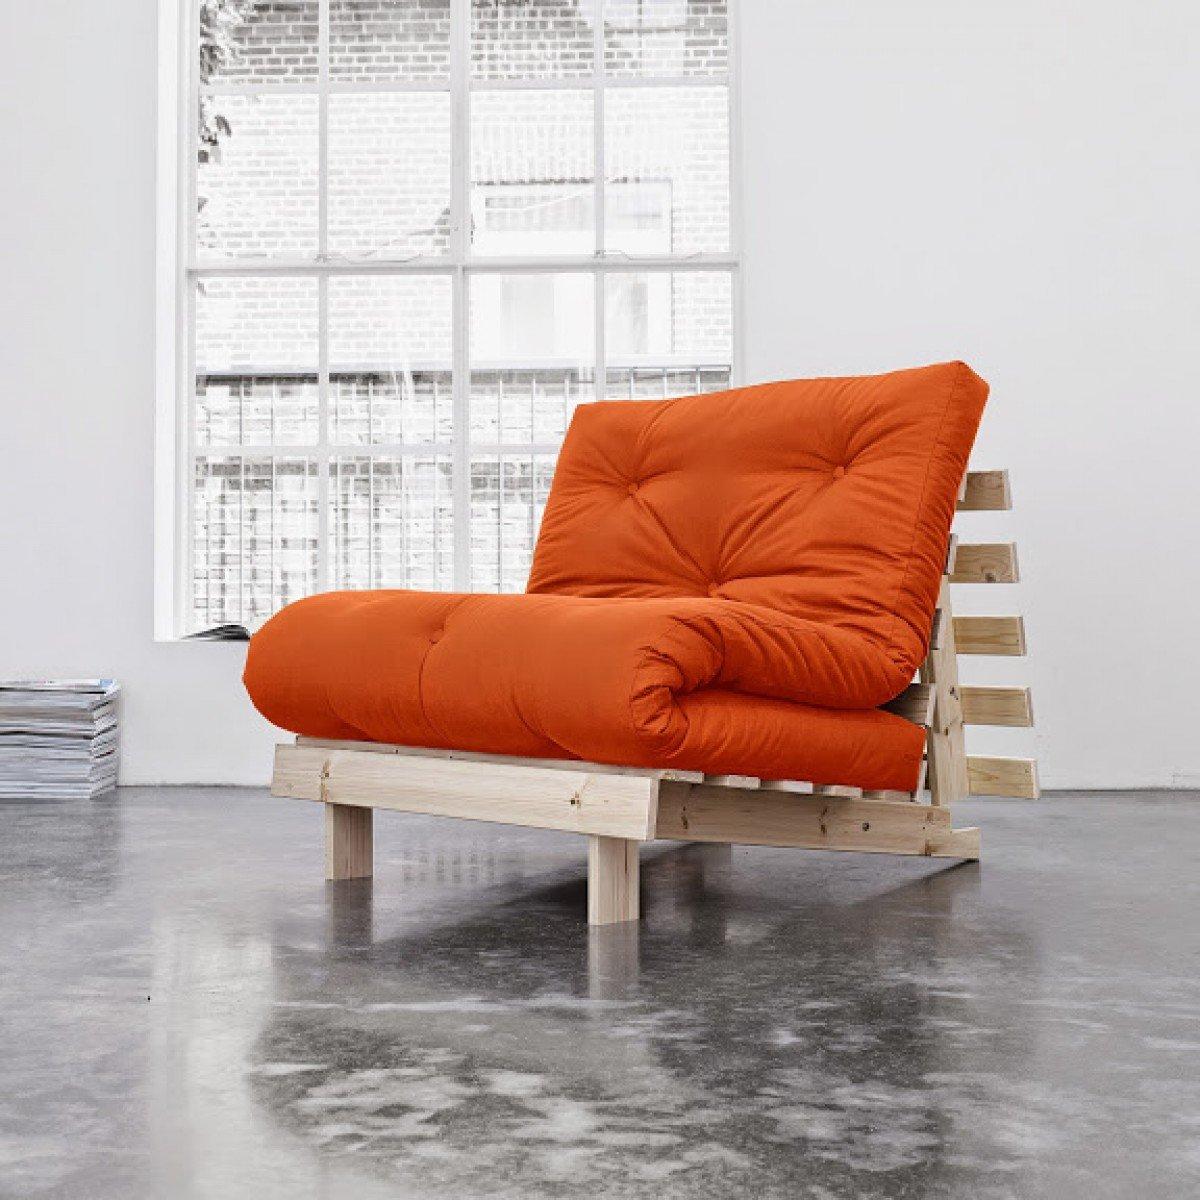 Pack Colchón futón Goyave algodón estructura en madera natural, algodón, 90 x 200: Amazon.es: Hogar